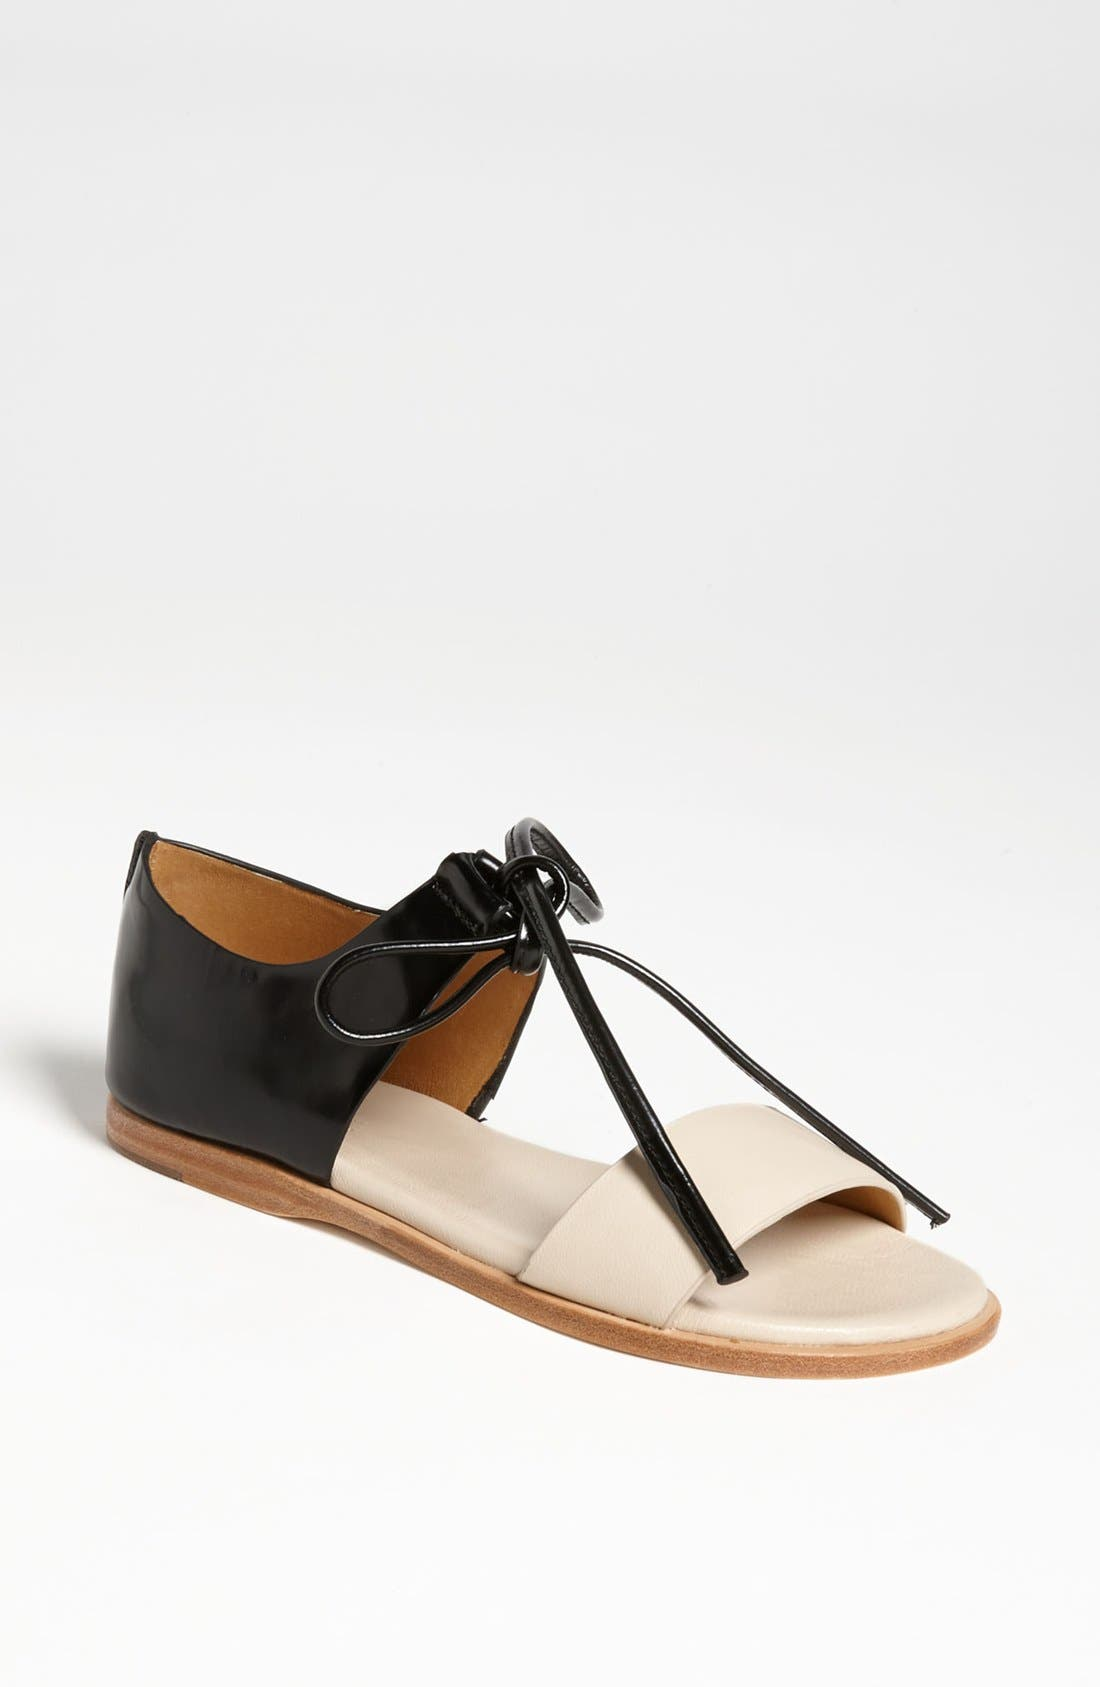 Main Image - Fiel 'Noss' Sandal